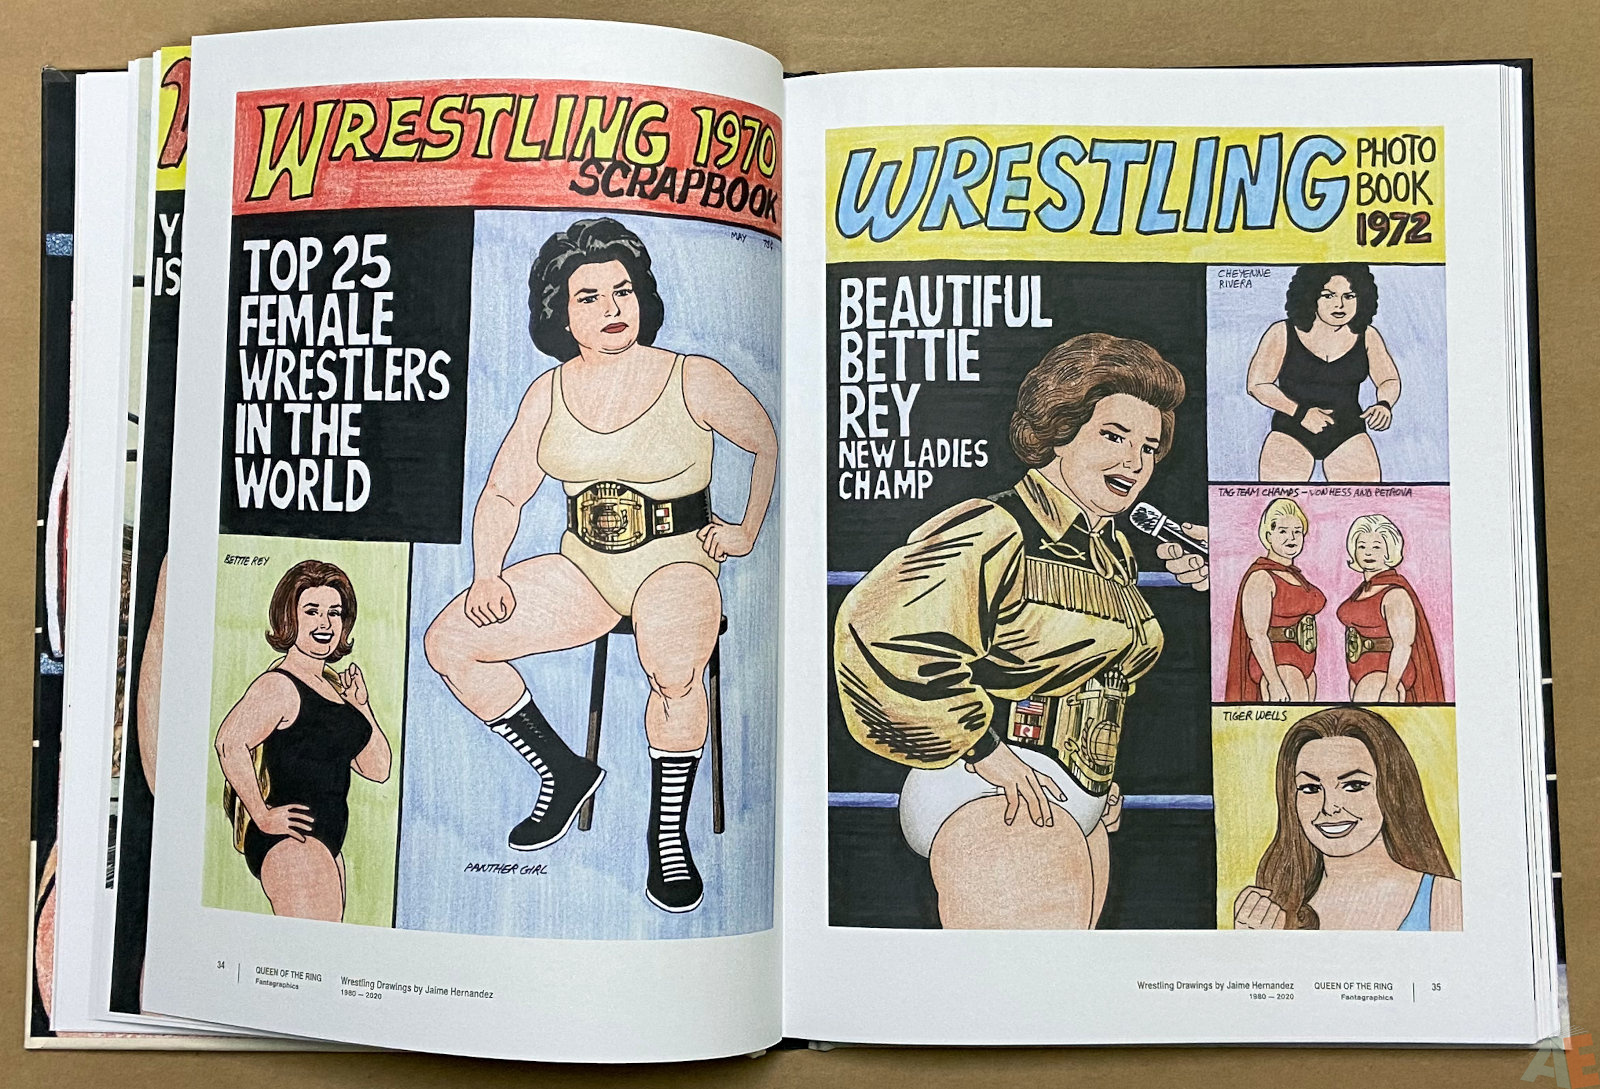 Queen of the Ring Wrestling Drawings by Jaime Hernandez 1980 2020 interior 5